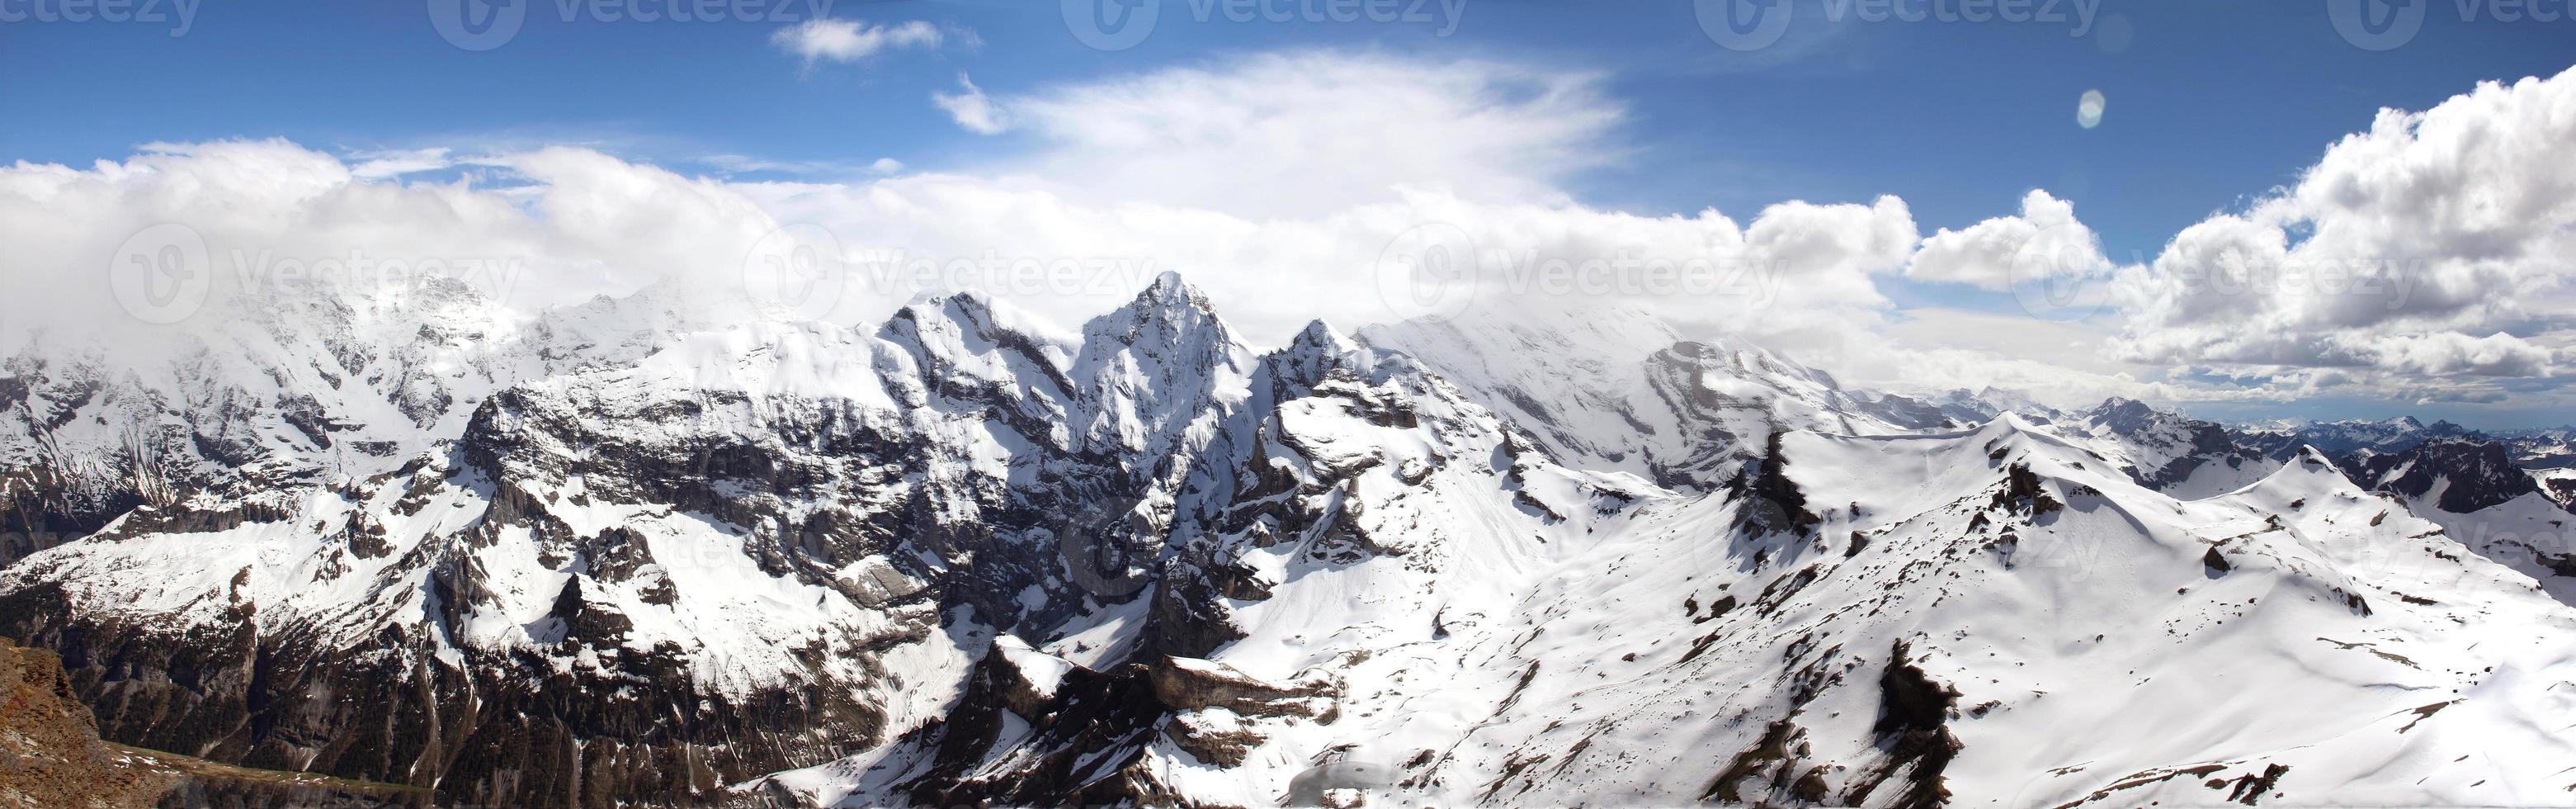 panaorma i Alperna i Schweiz foto